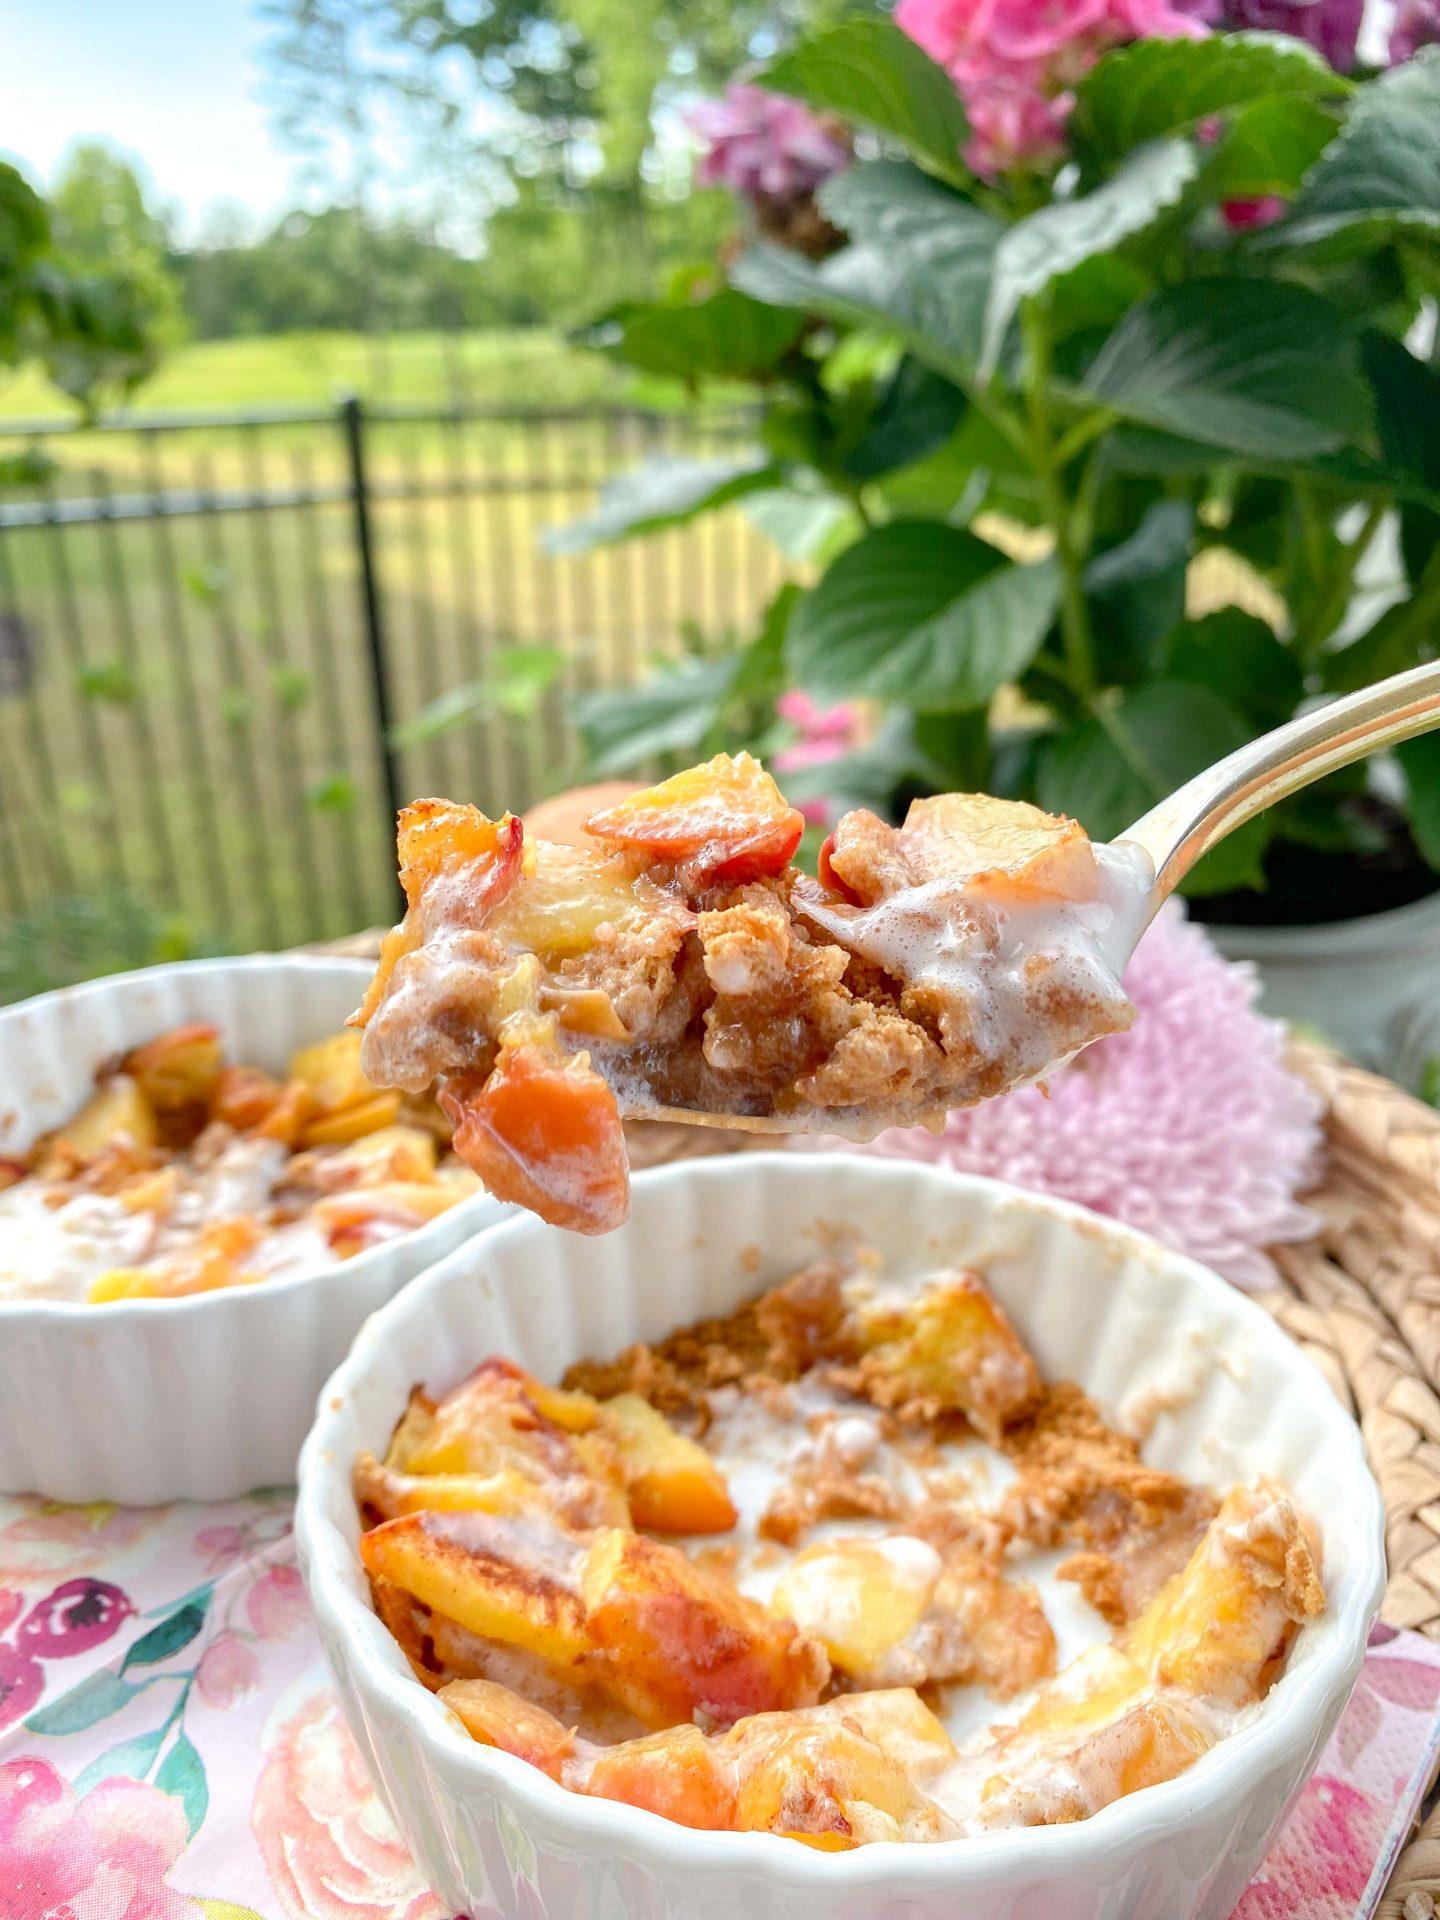 tiktok, peach pie, low calorie dessert, peaches, mini peach pies